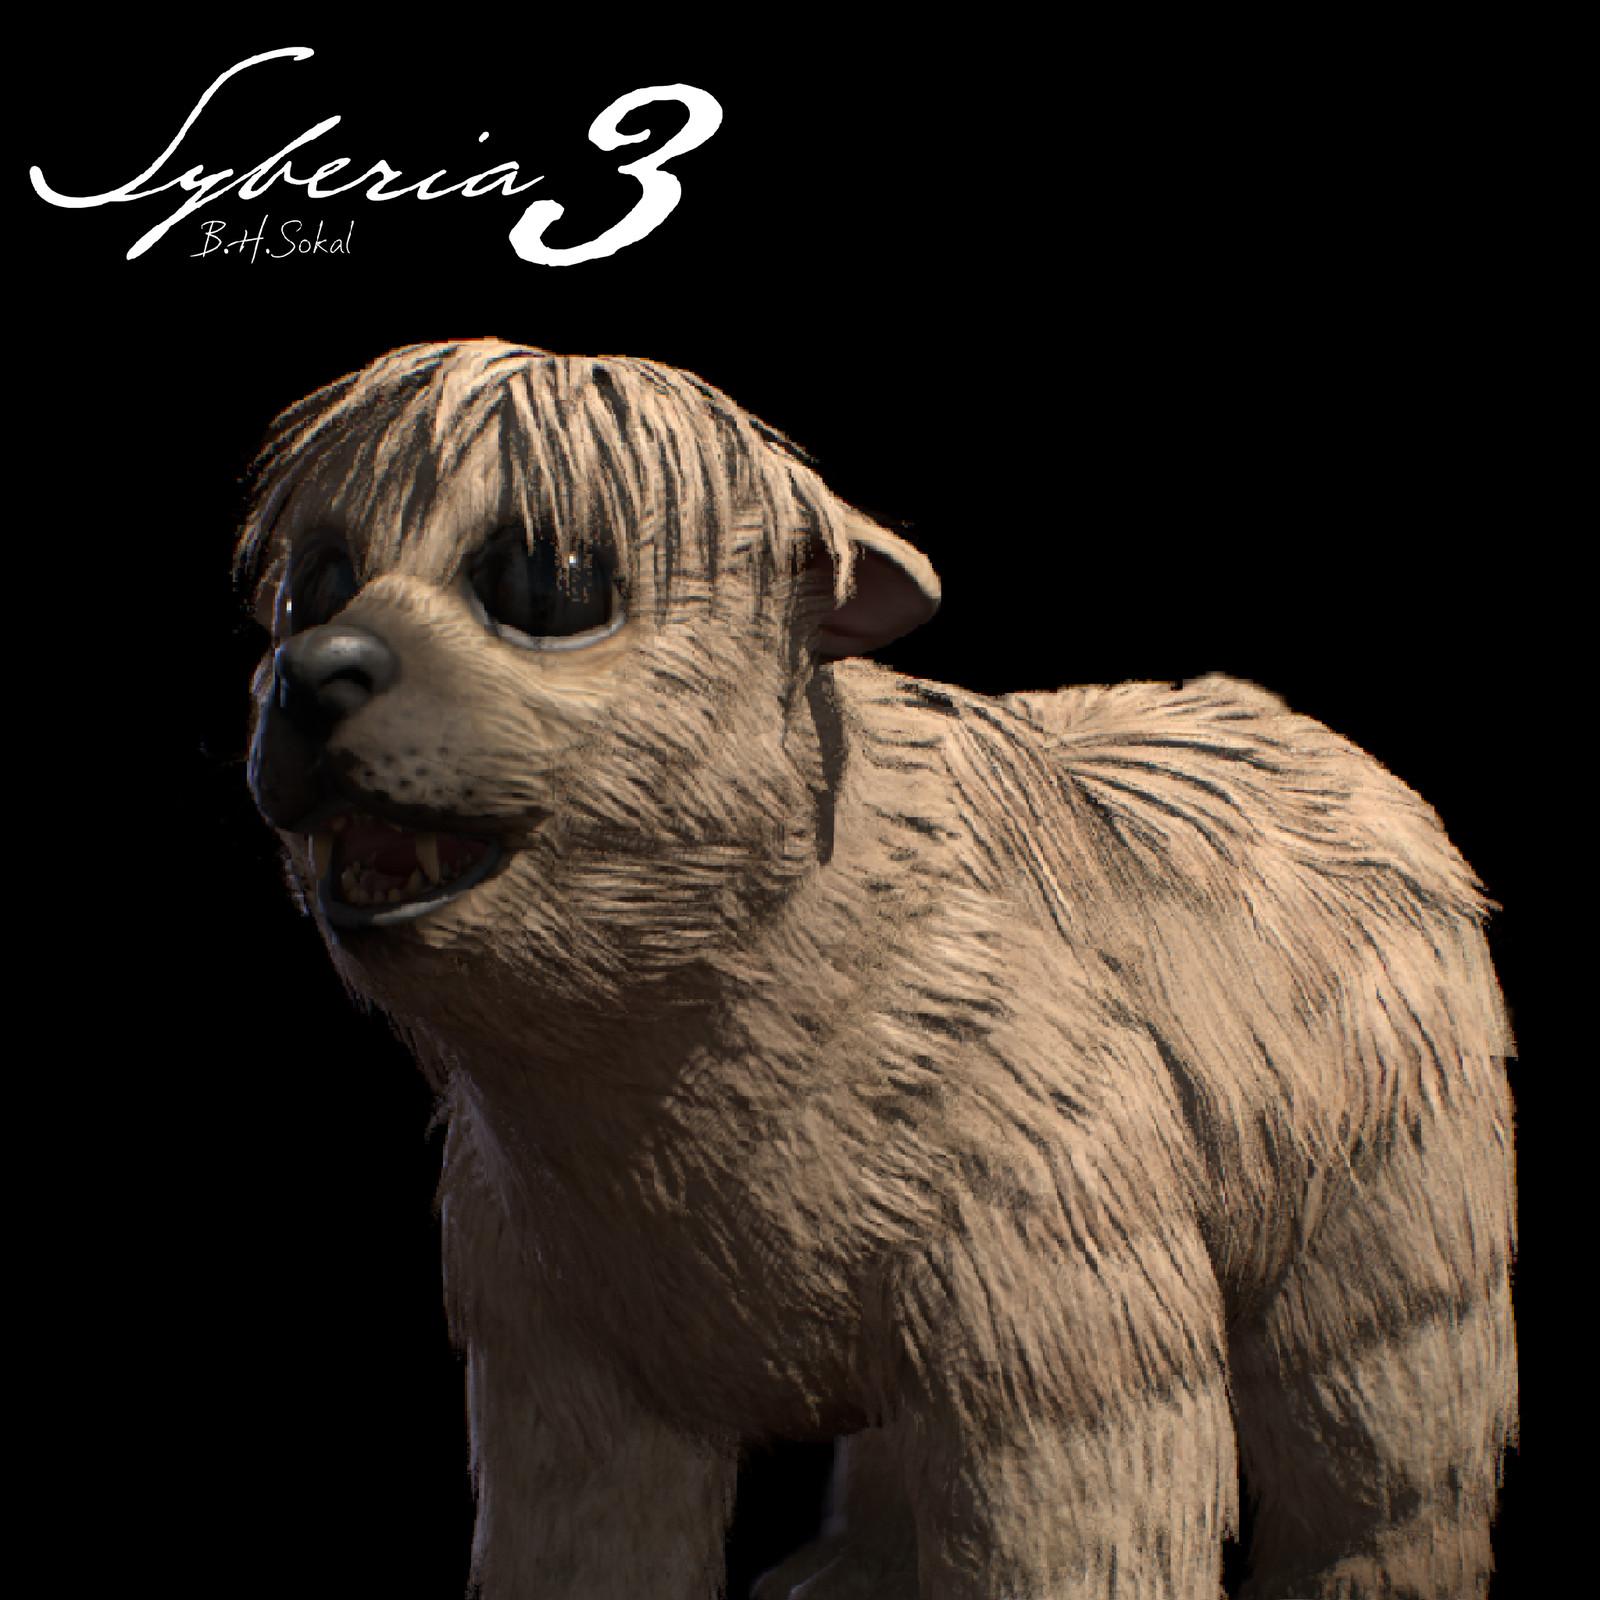 Syberia 3 : Youki